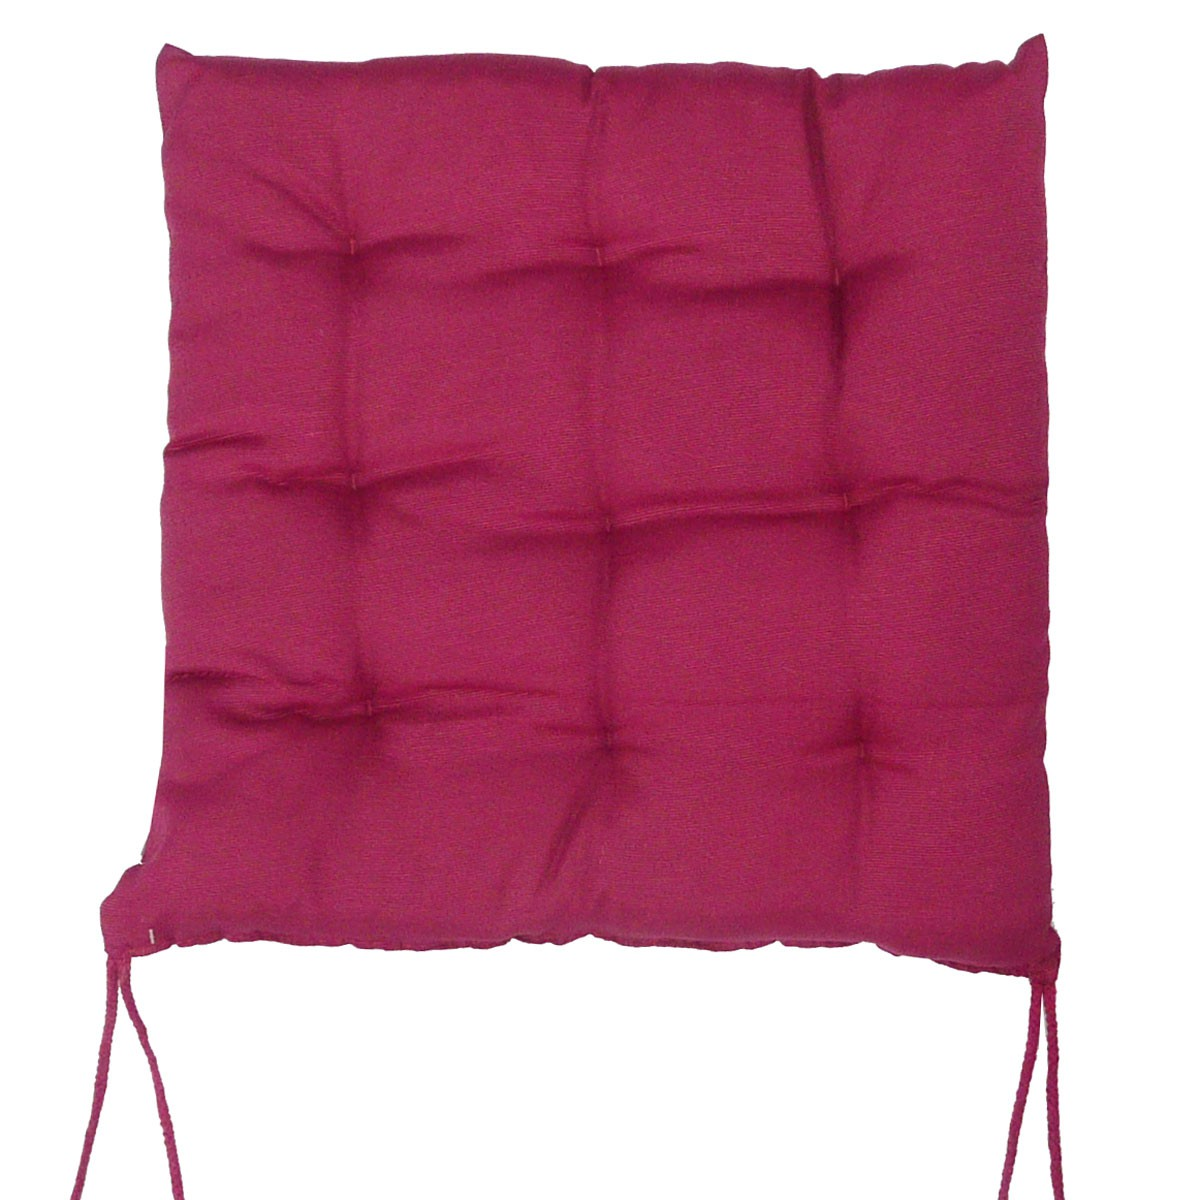 stuhlkissen rib optik mit 4 kordelb ndern 40x40x4cm kirschrot wohntextilien kissen stuhlkissen. Black Bedroom Furniture Sets. Home Design Ideas